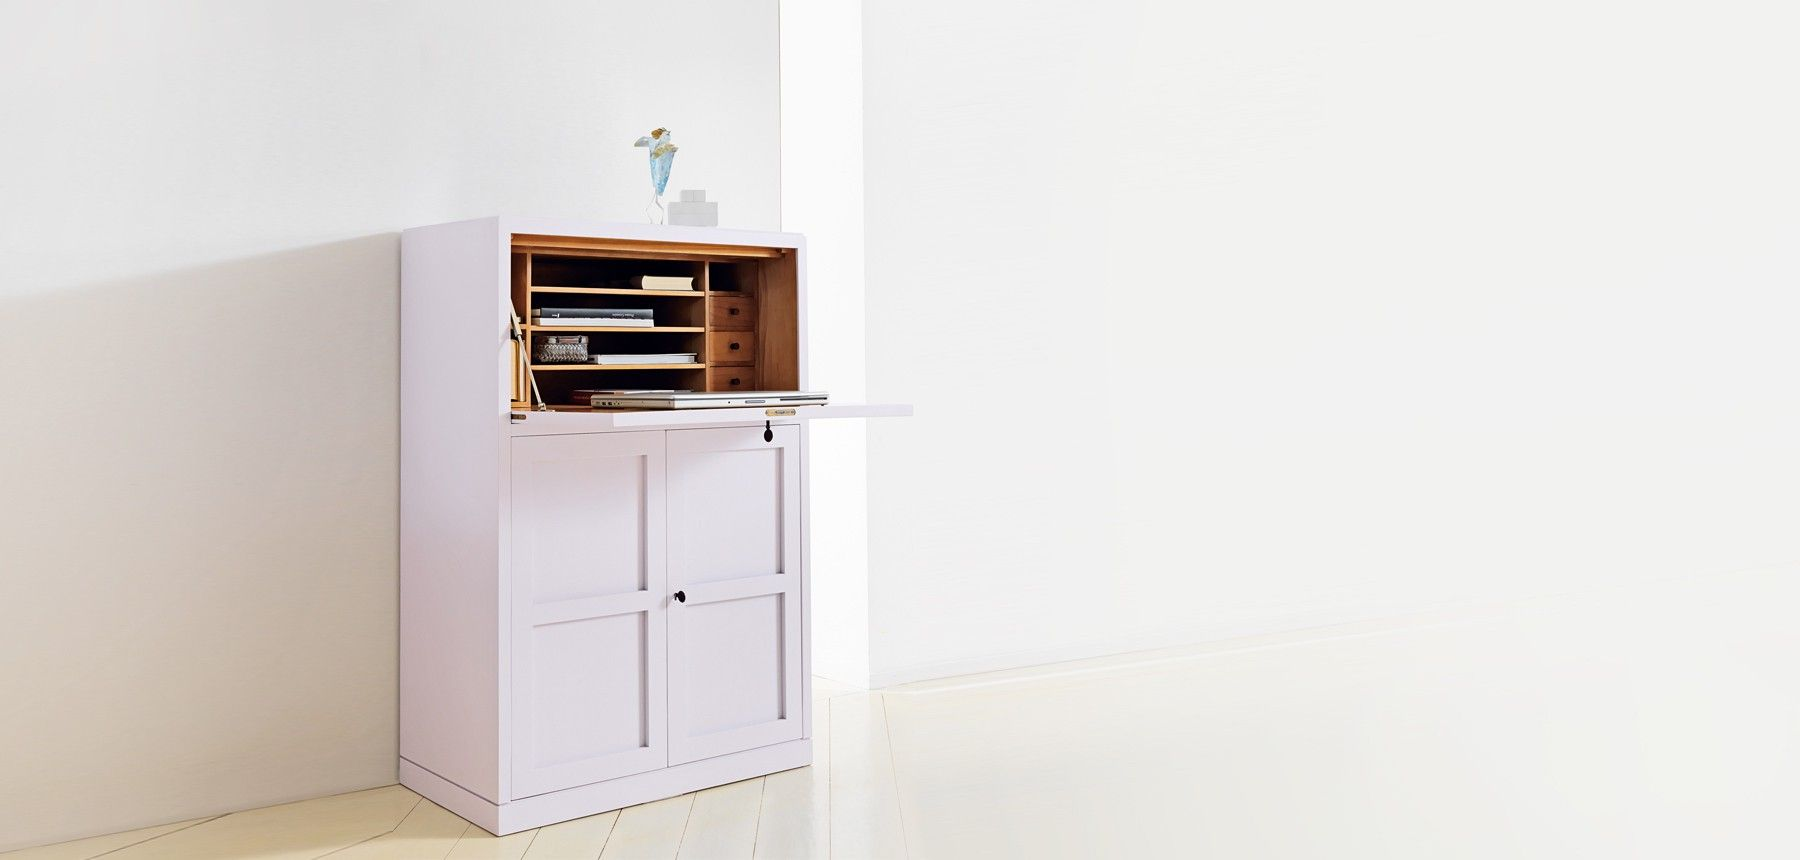 Sekretare Marktex Tall Cabinet Storage Home Decor Furniture